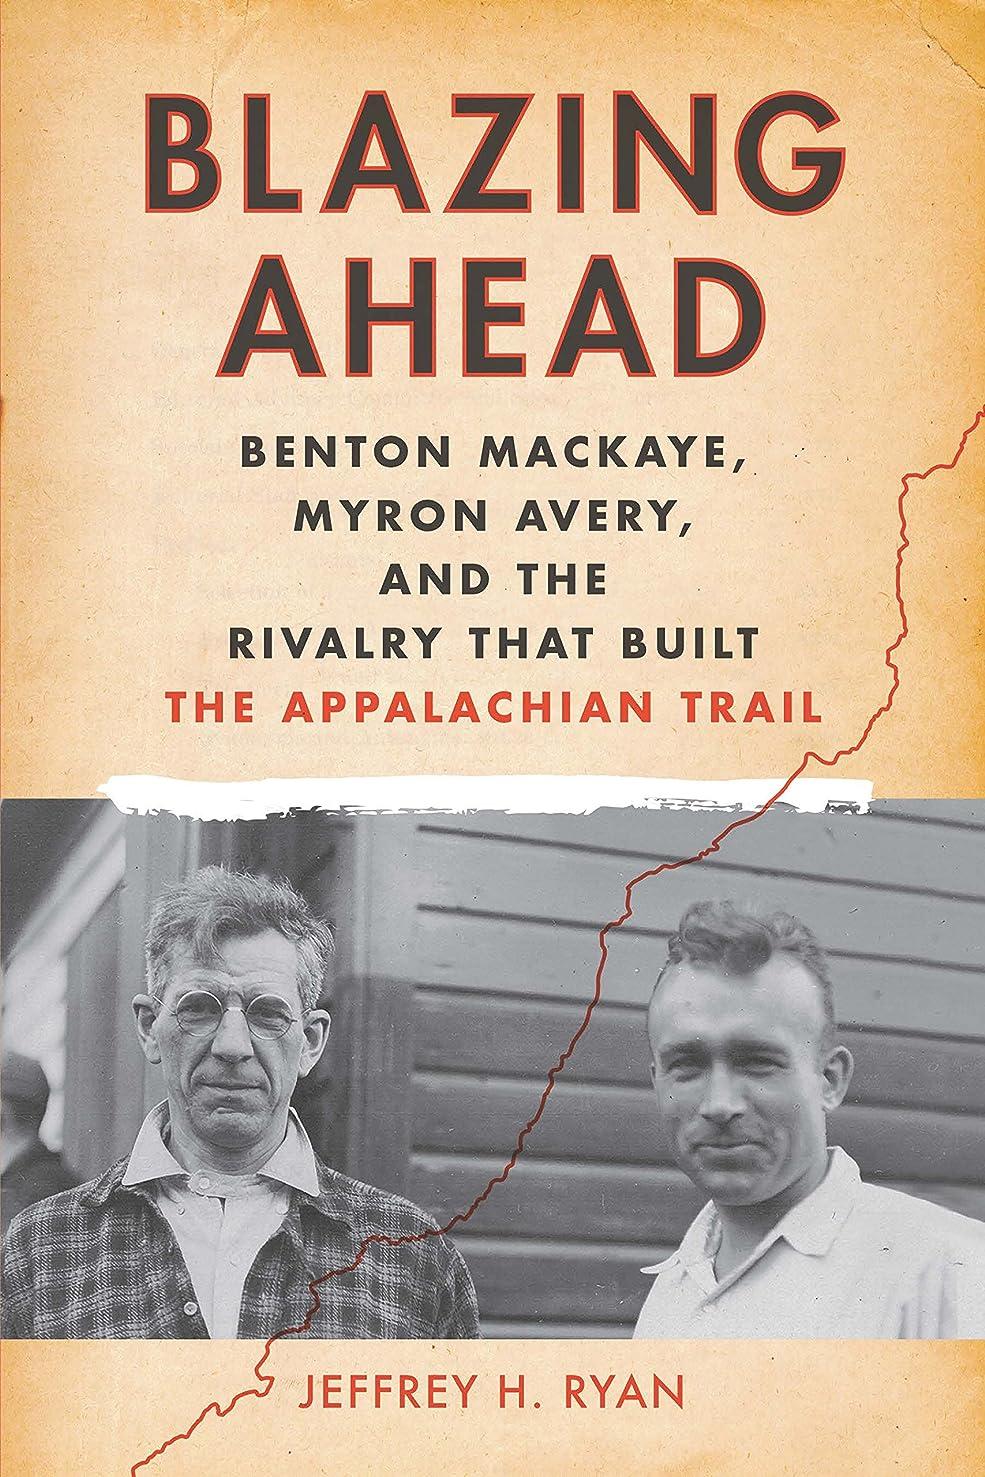 Blazing Ahead: Benton MacKaye, Myron Avery, and the Rivalry That Built the Appalachian Trail